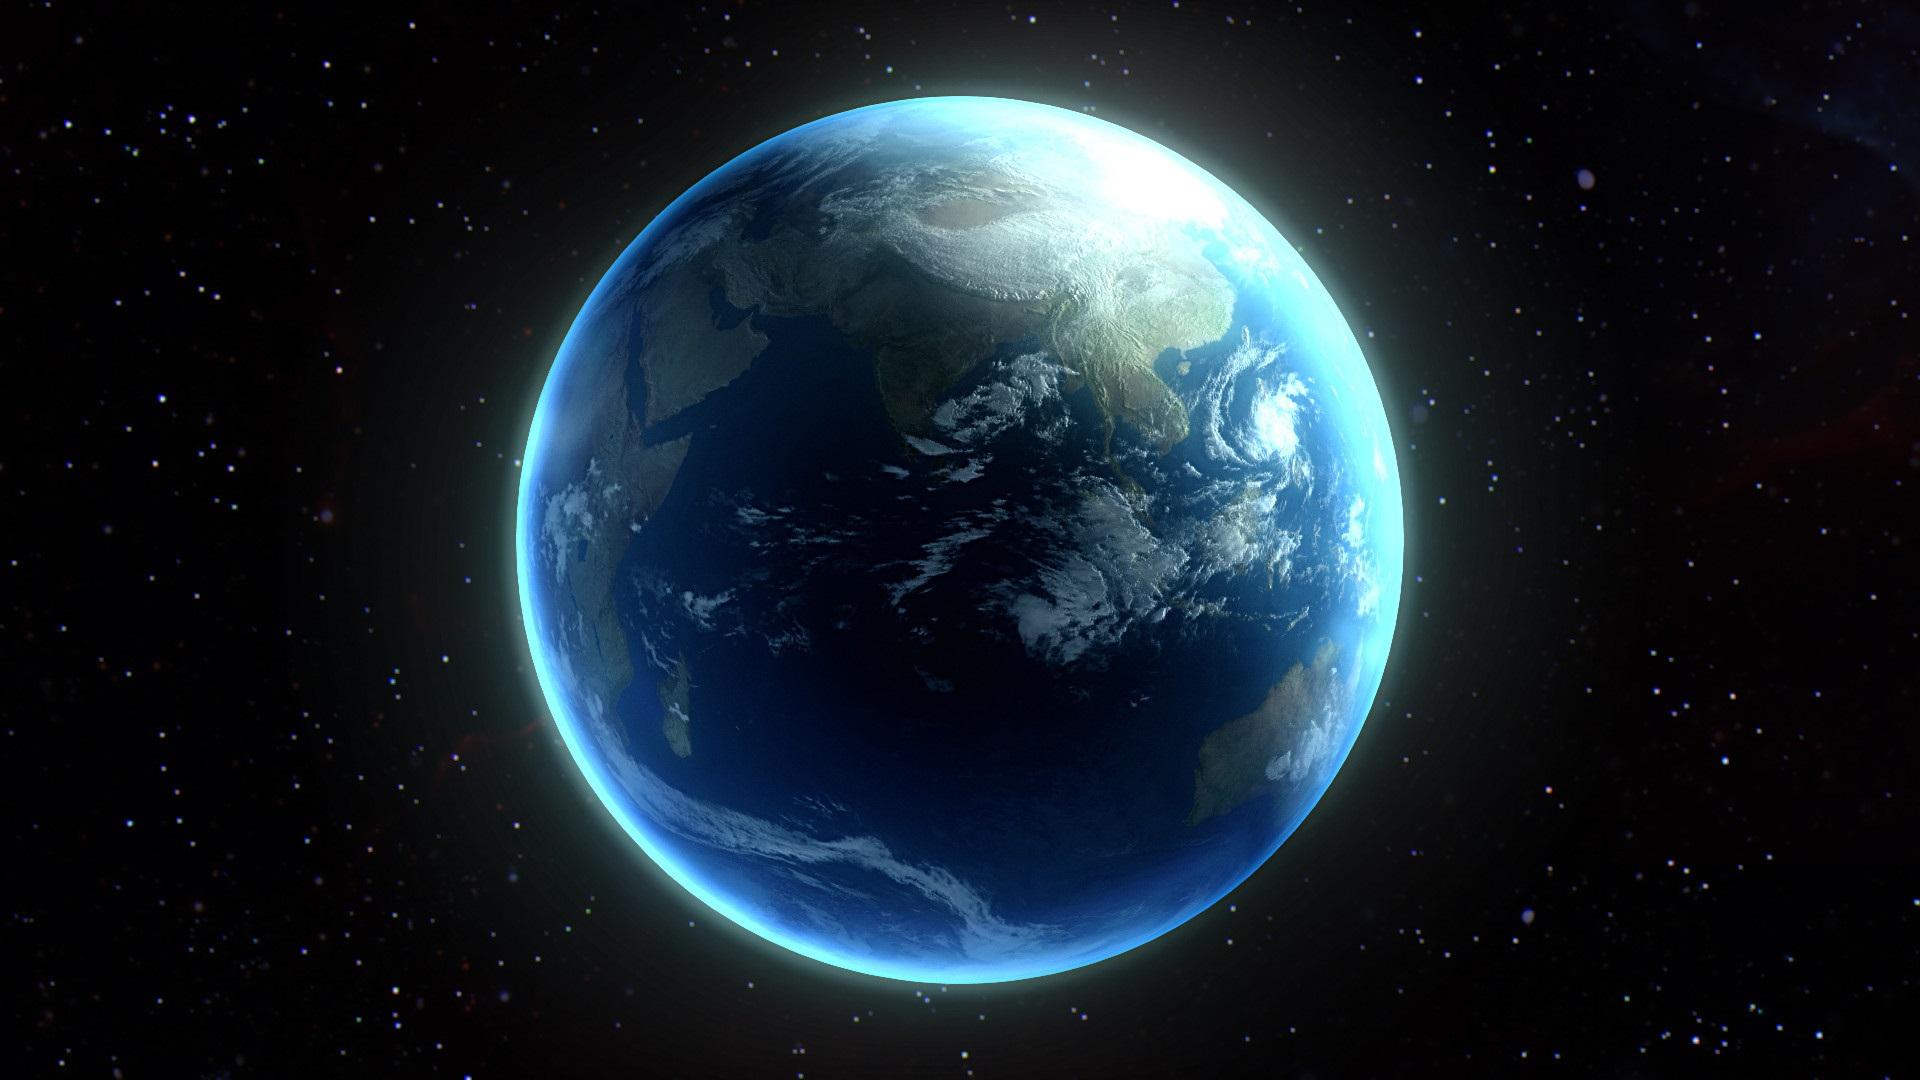 wallpaper beautiful planet, earth, space 1920x1080 full hd 2k